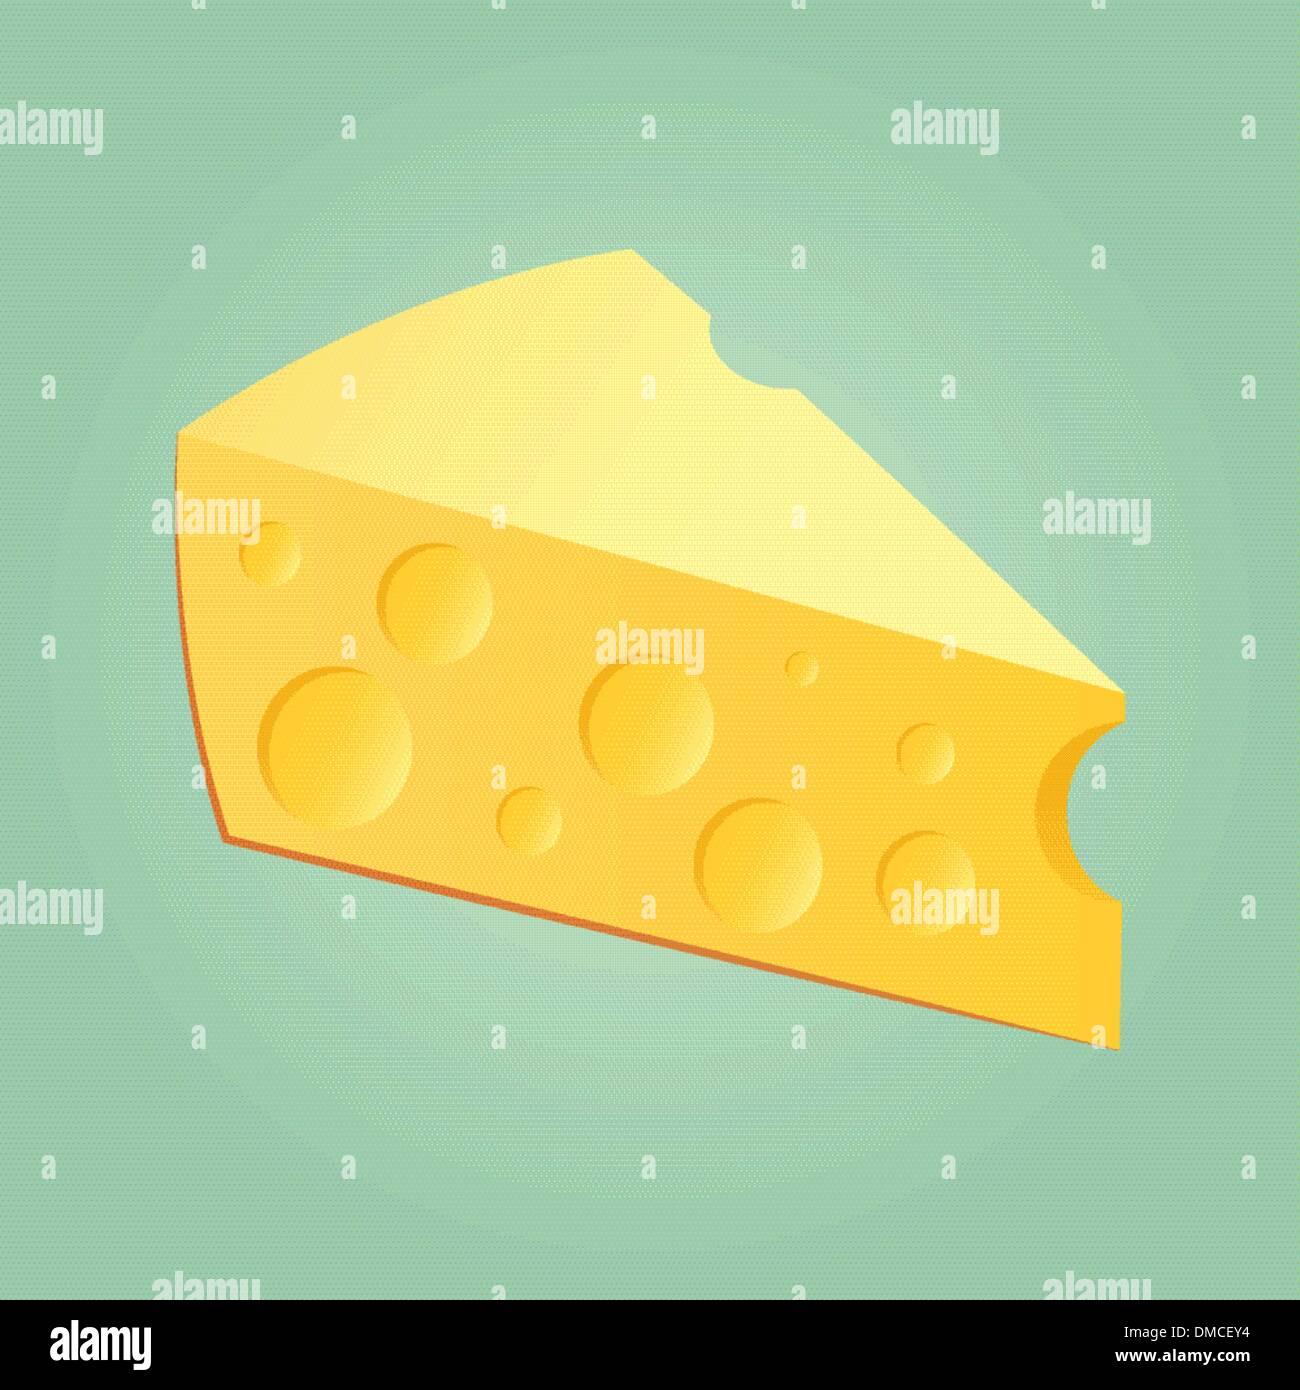 Laje de queijo Imagens de Stock